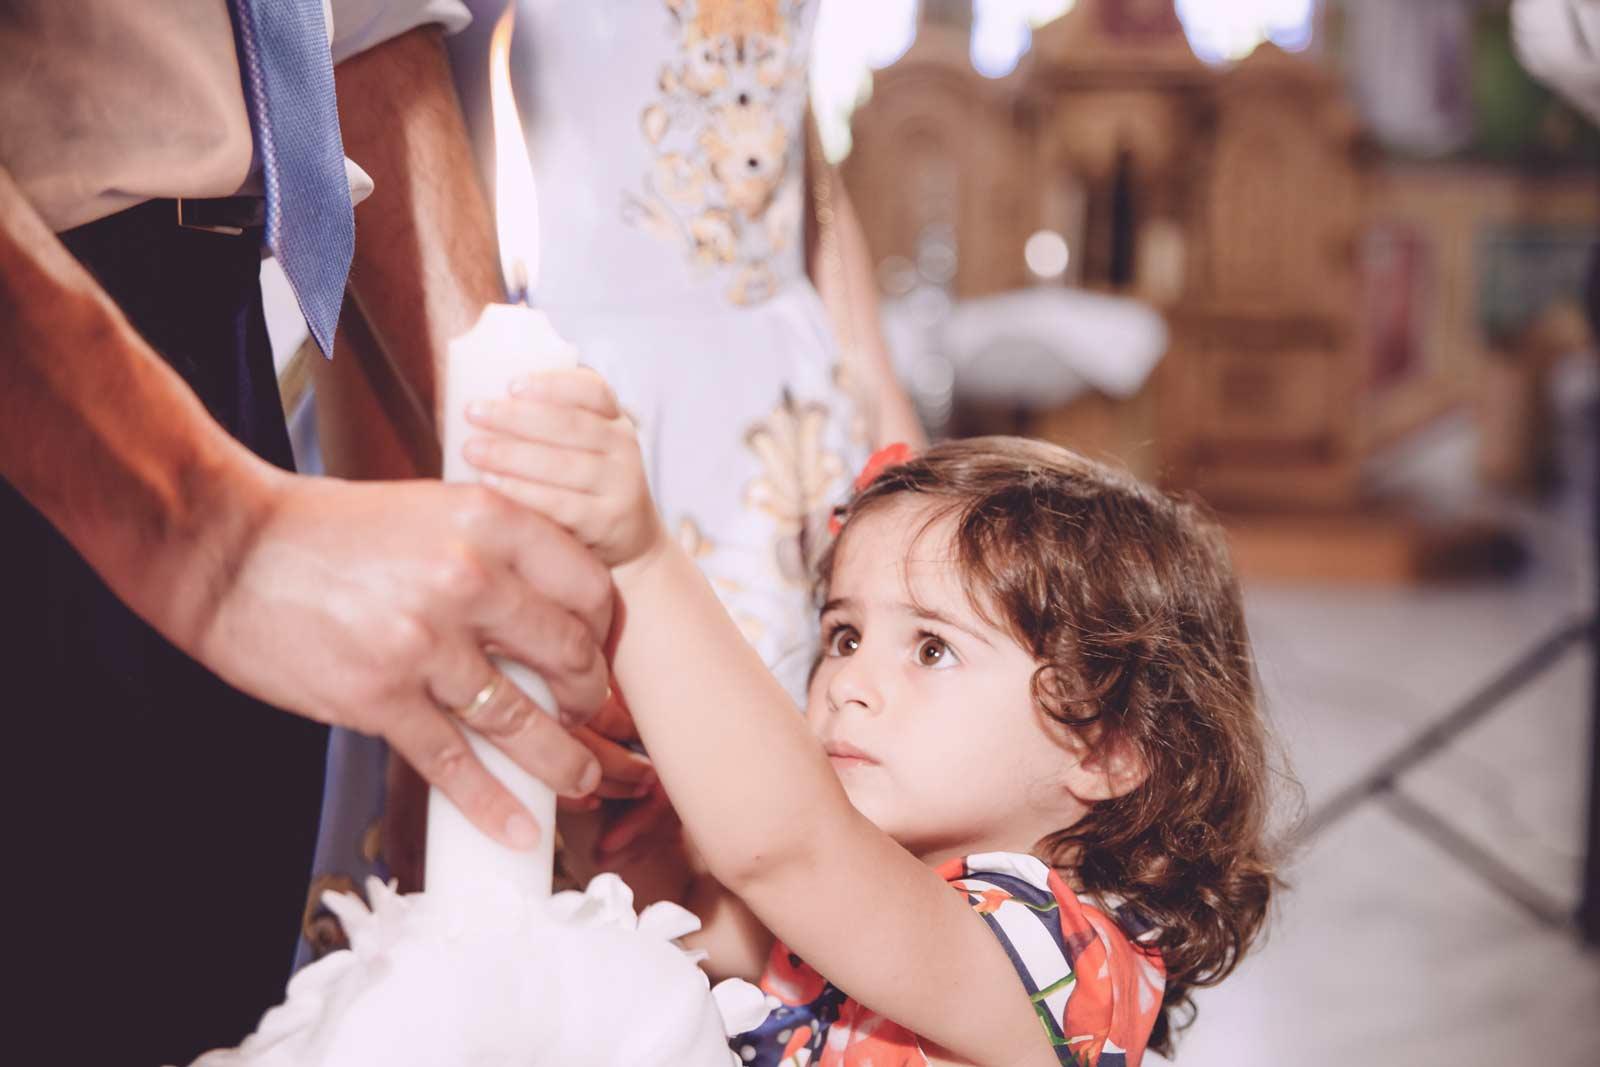 344 PhotoVaptisis βαπτιση βουλα αγιος νεκταριος vaptisi fotografos moro mama nona 016 PhotoVaptisis